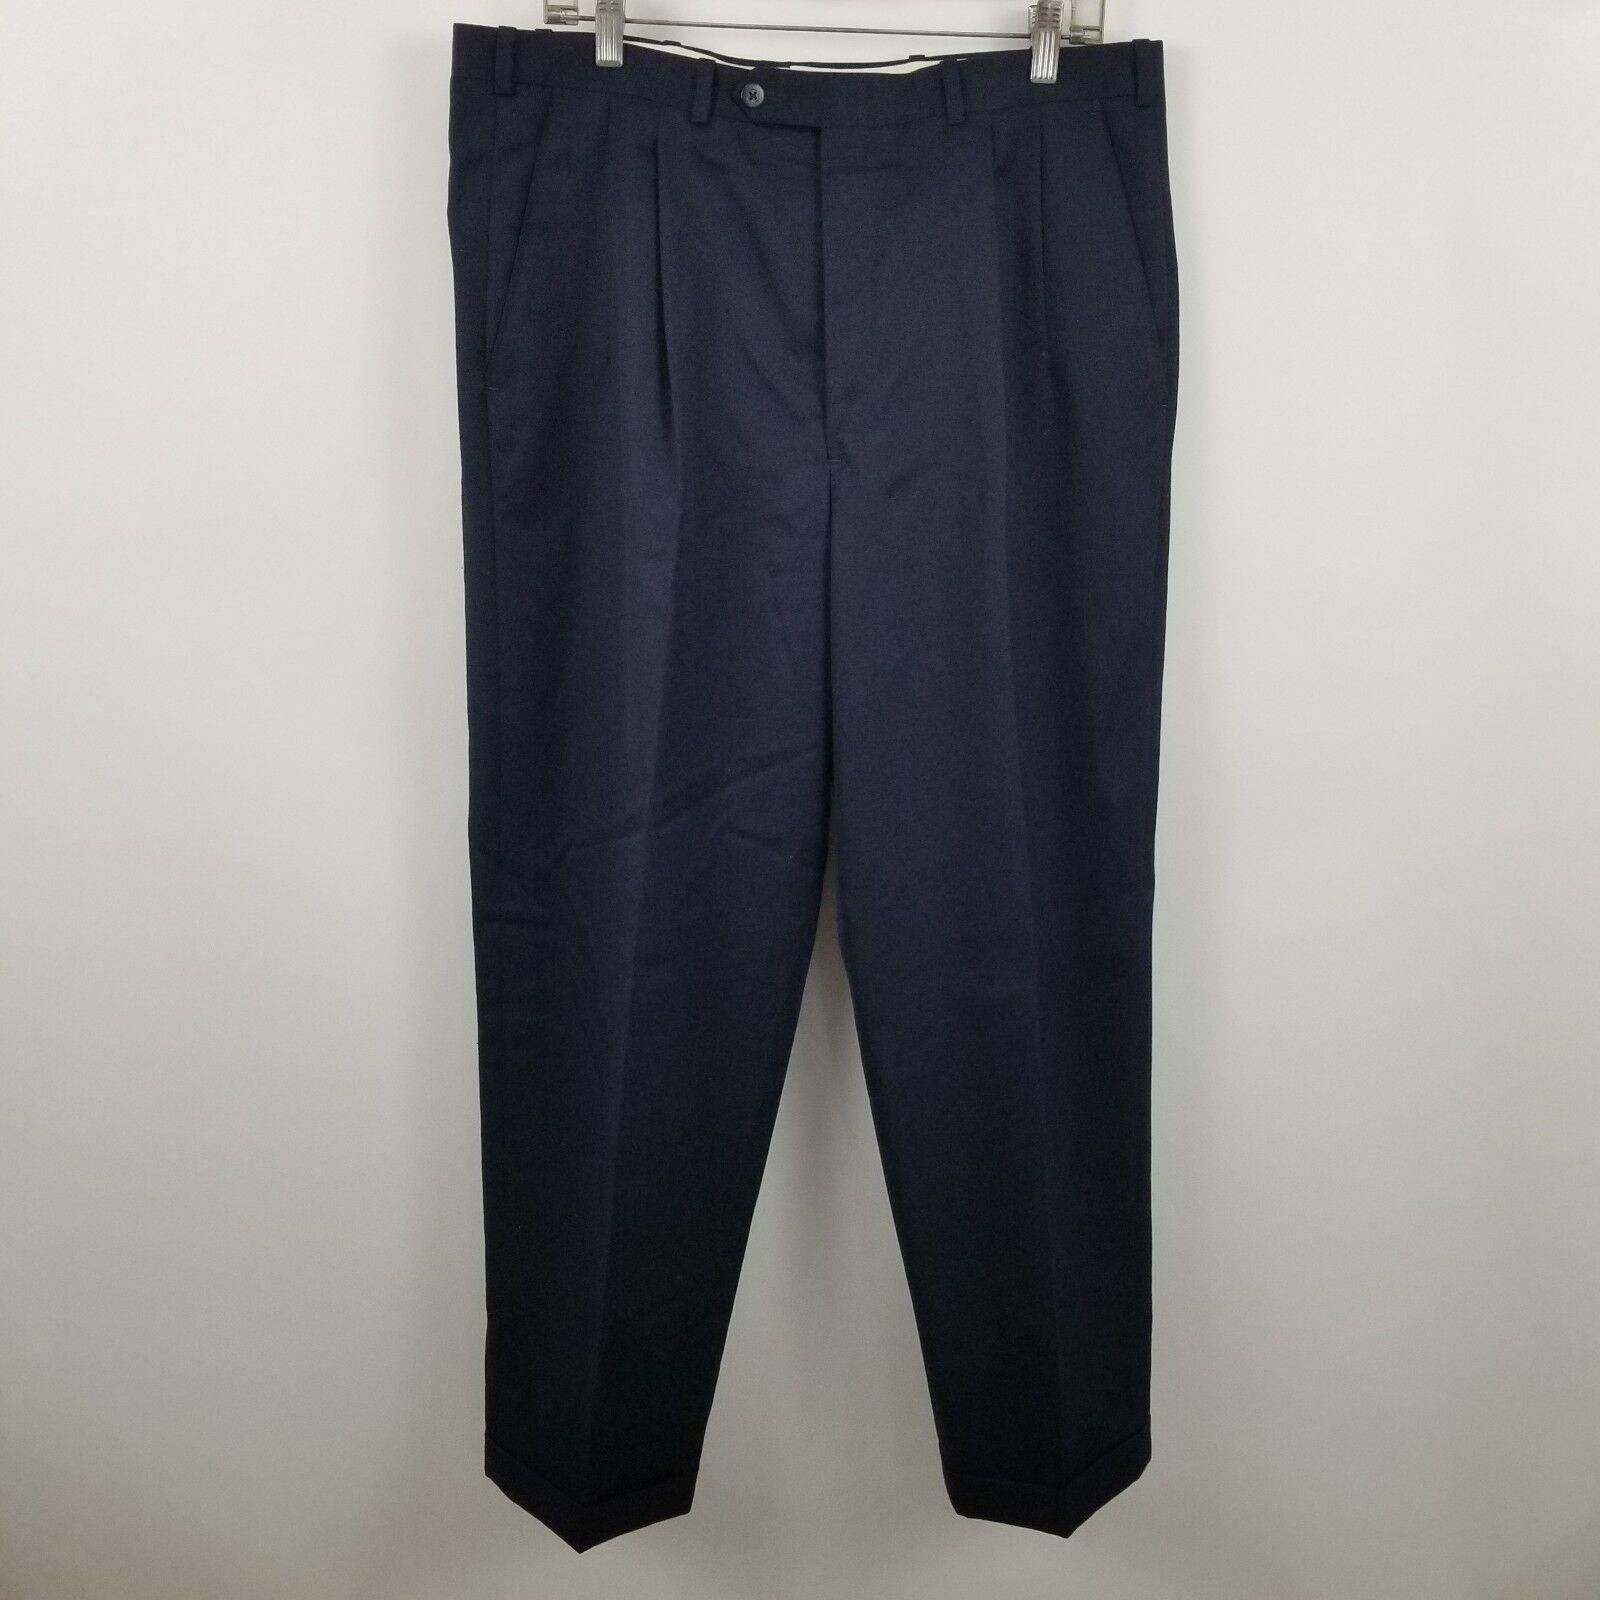 Nordstrom JB Britches Men's Pleated Dark bluee Dress Pants Size 36 x 28